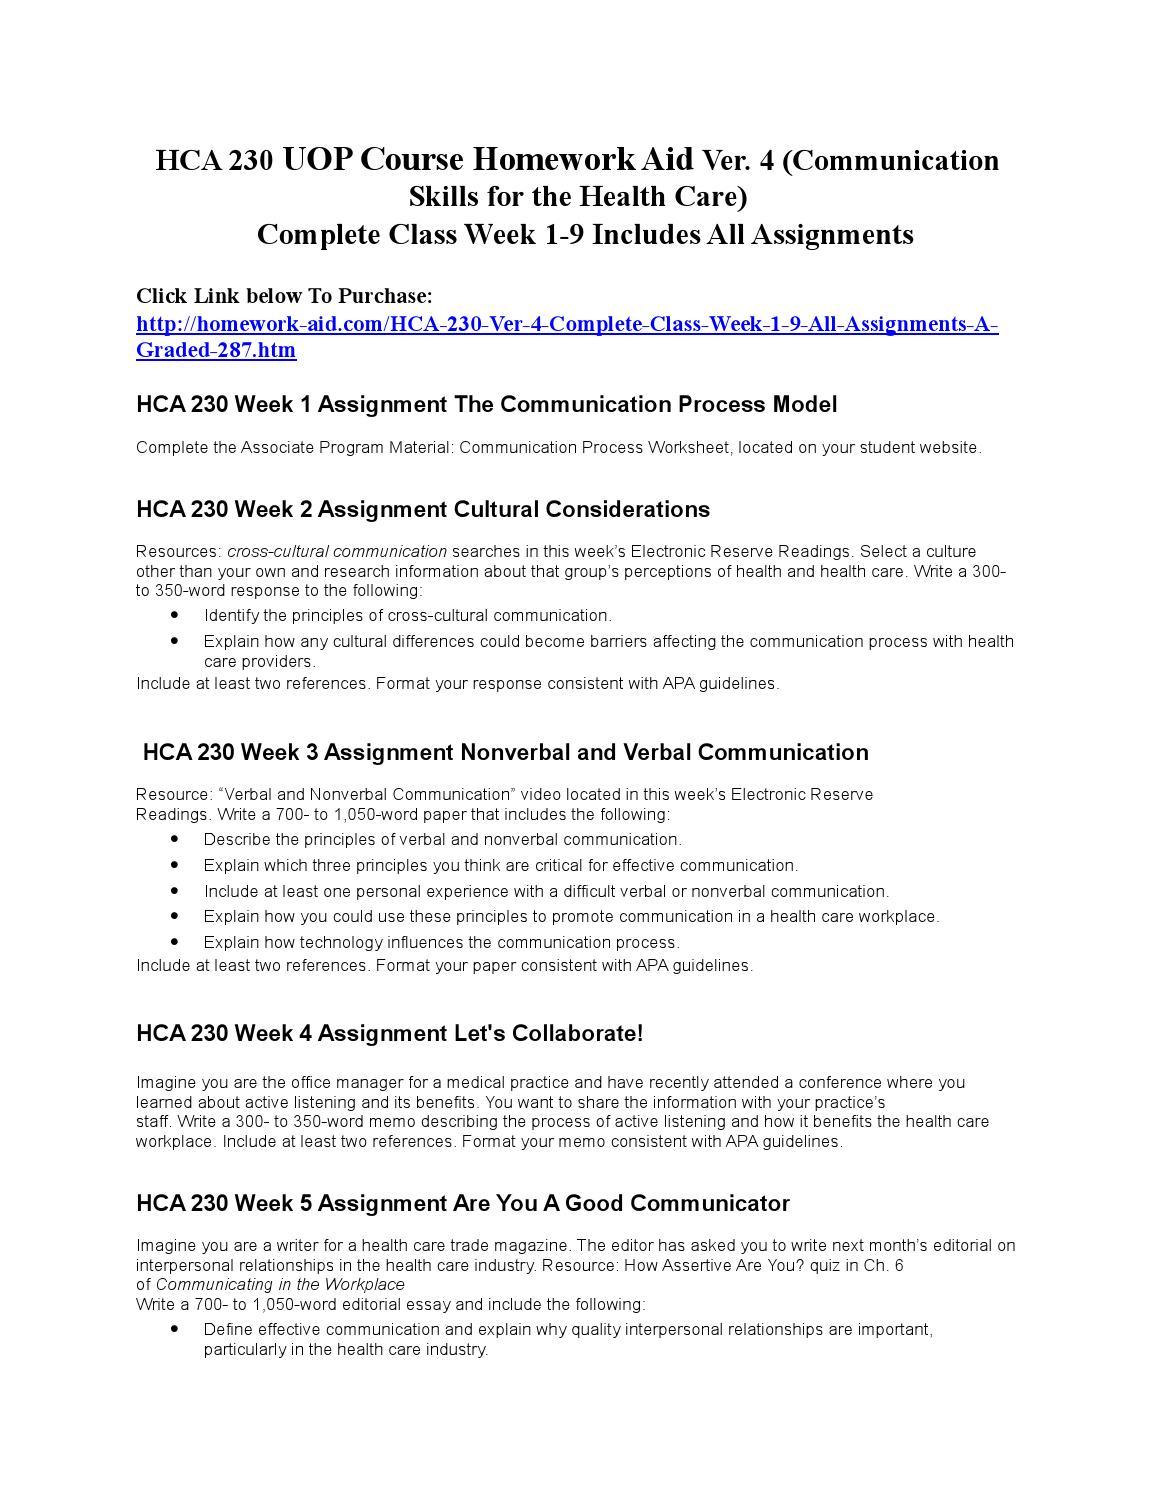 hca 230 communication skills for health Verbal and nonverbal communication angelina hopson hca/230  communication skills for the health care professional 2/19/2012 felencia h  mcgee verbal.